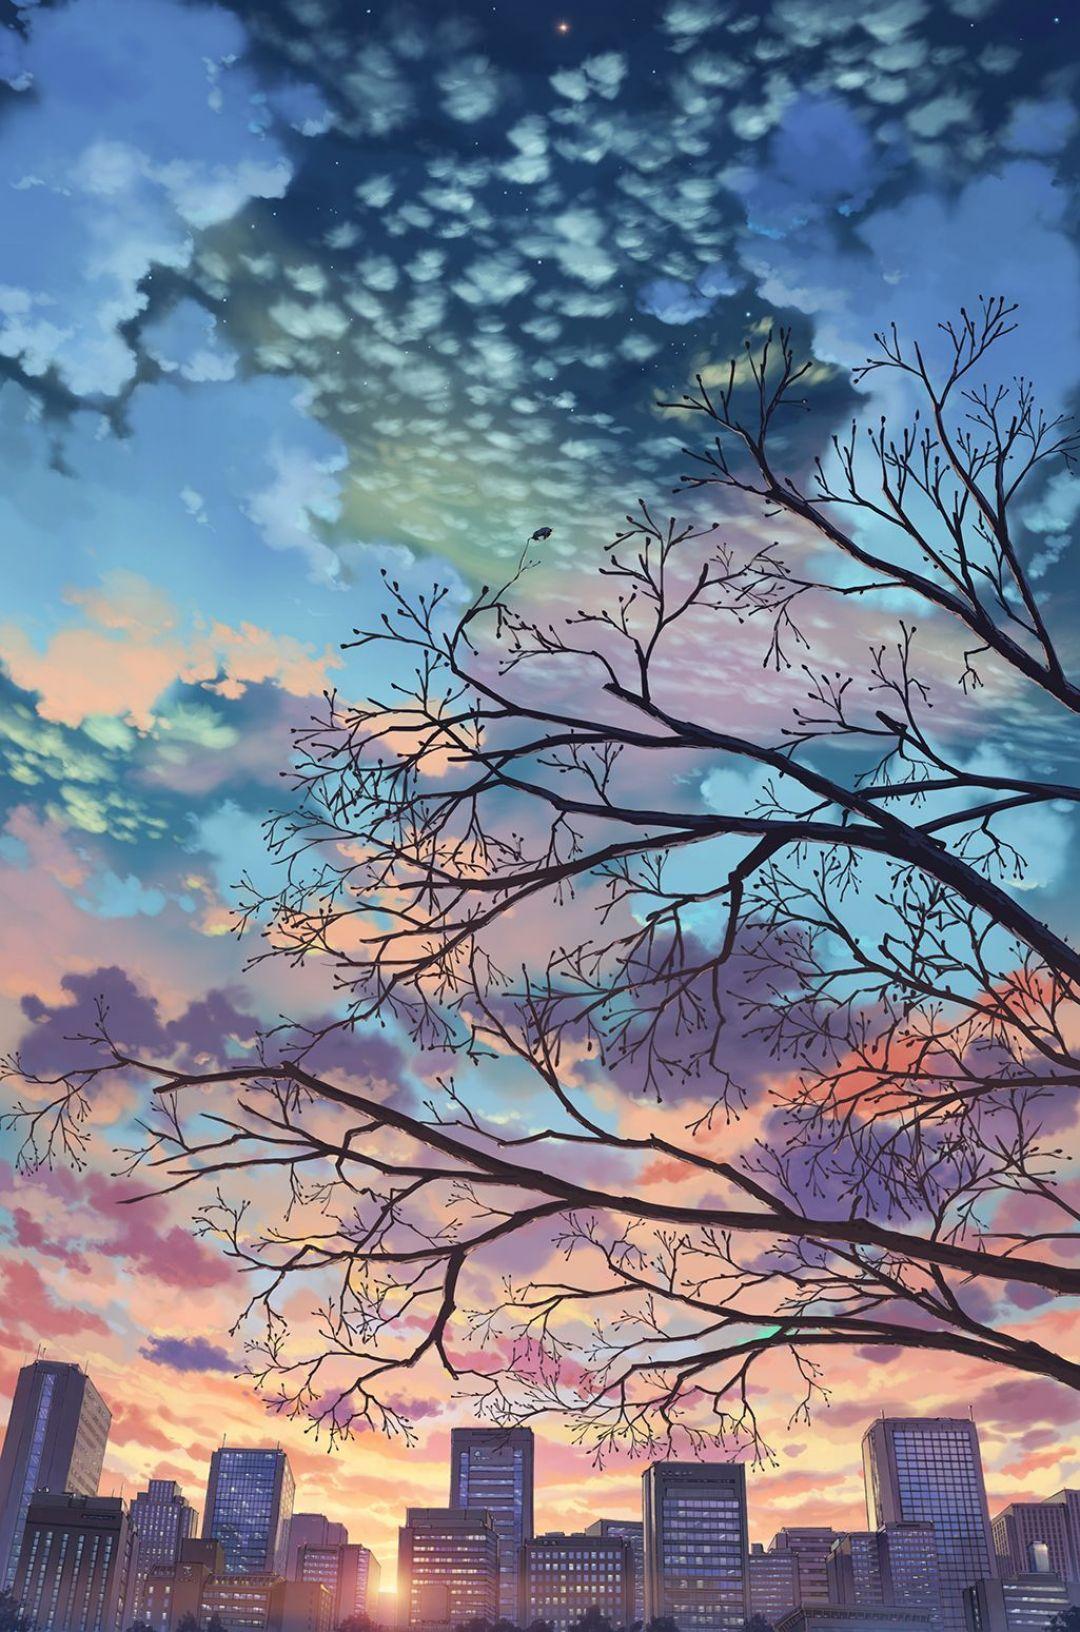 Aesthetic Anime Iphone 1080x1632 Wallpaper Teahub Io